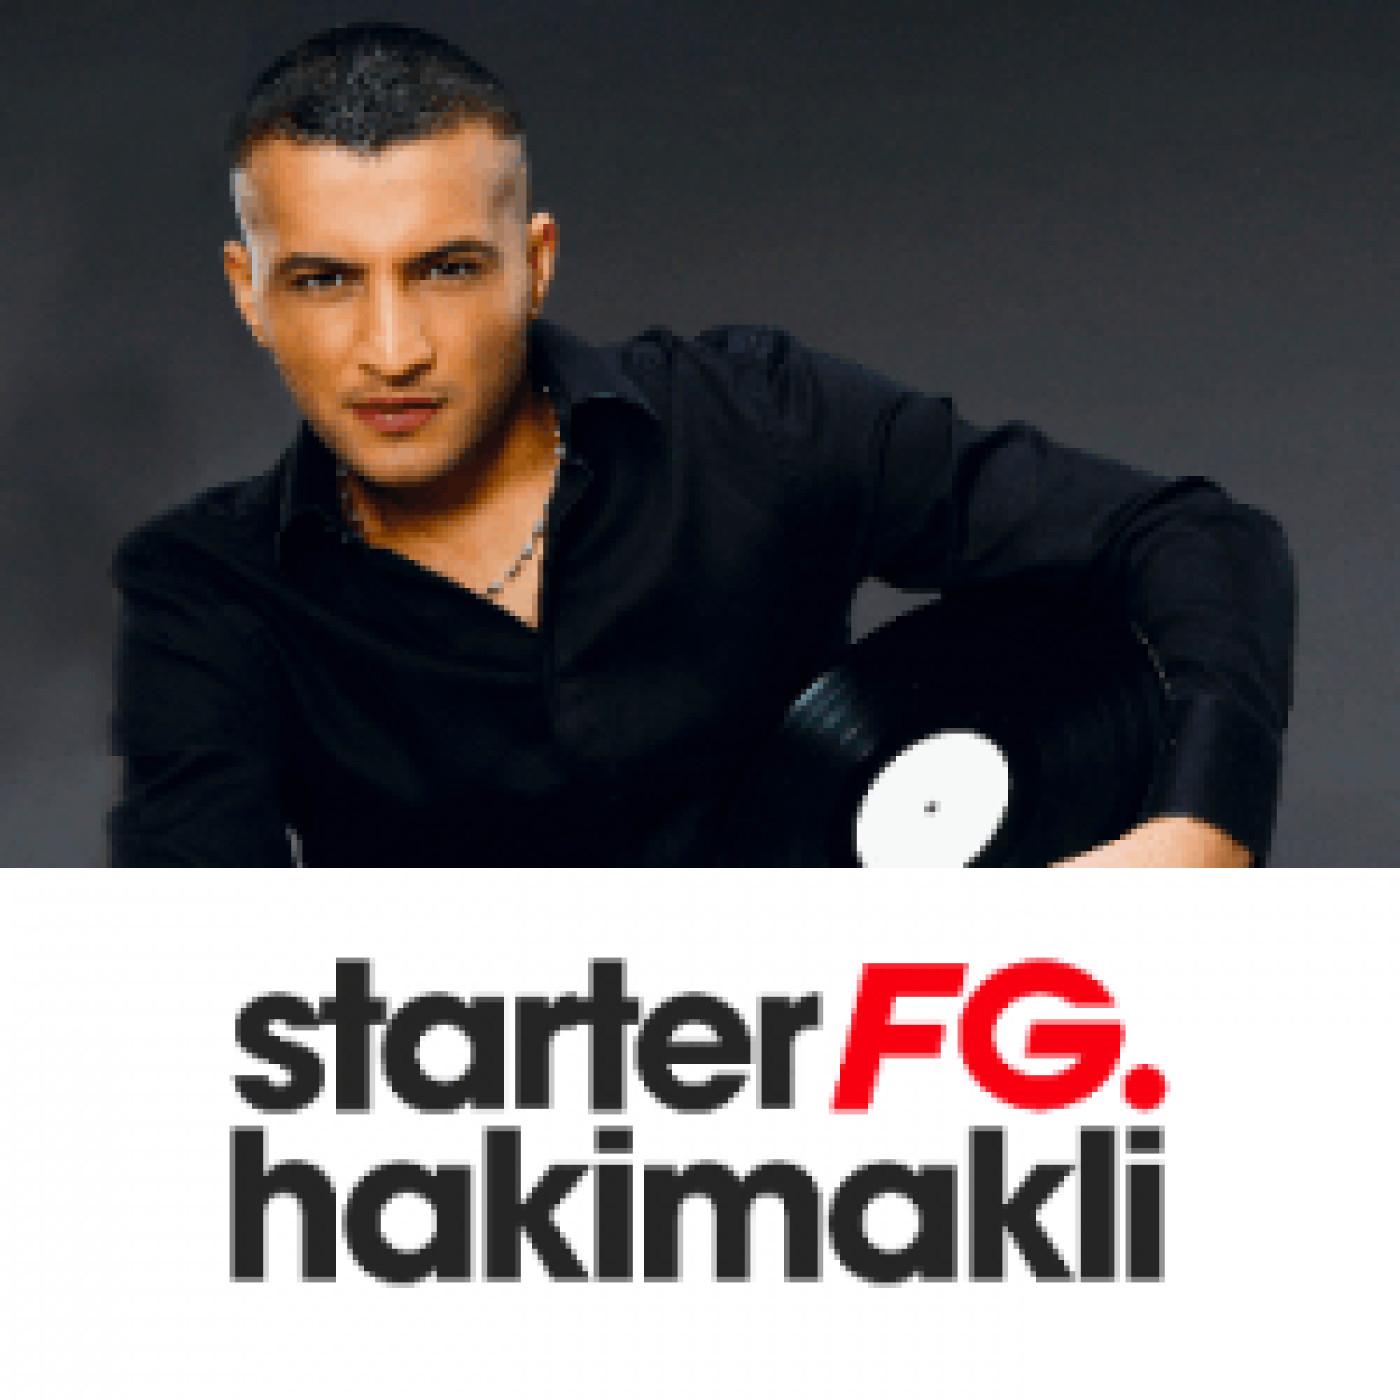 STARTER FG BY HAKIMAKLI LUNDI 28 DECEMBRE 2020